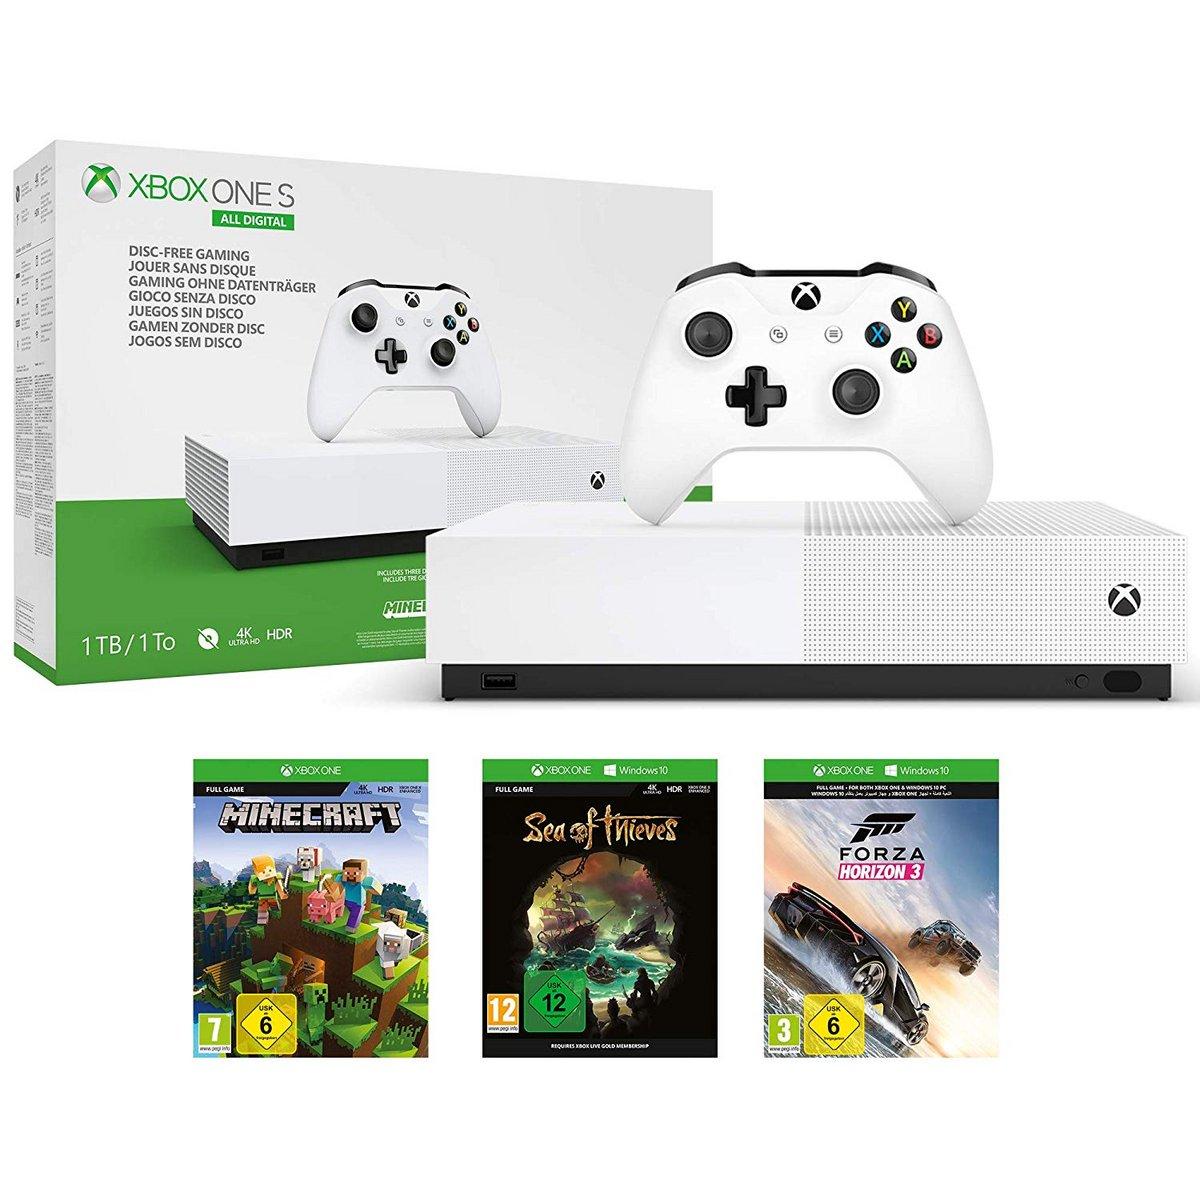 Xbox One Digital